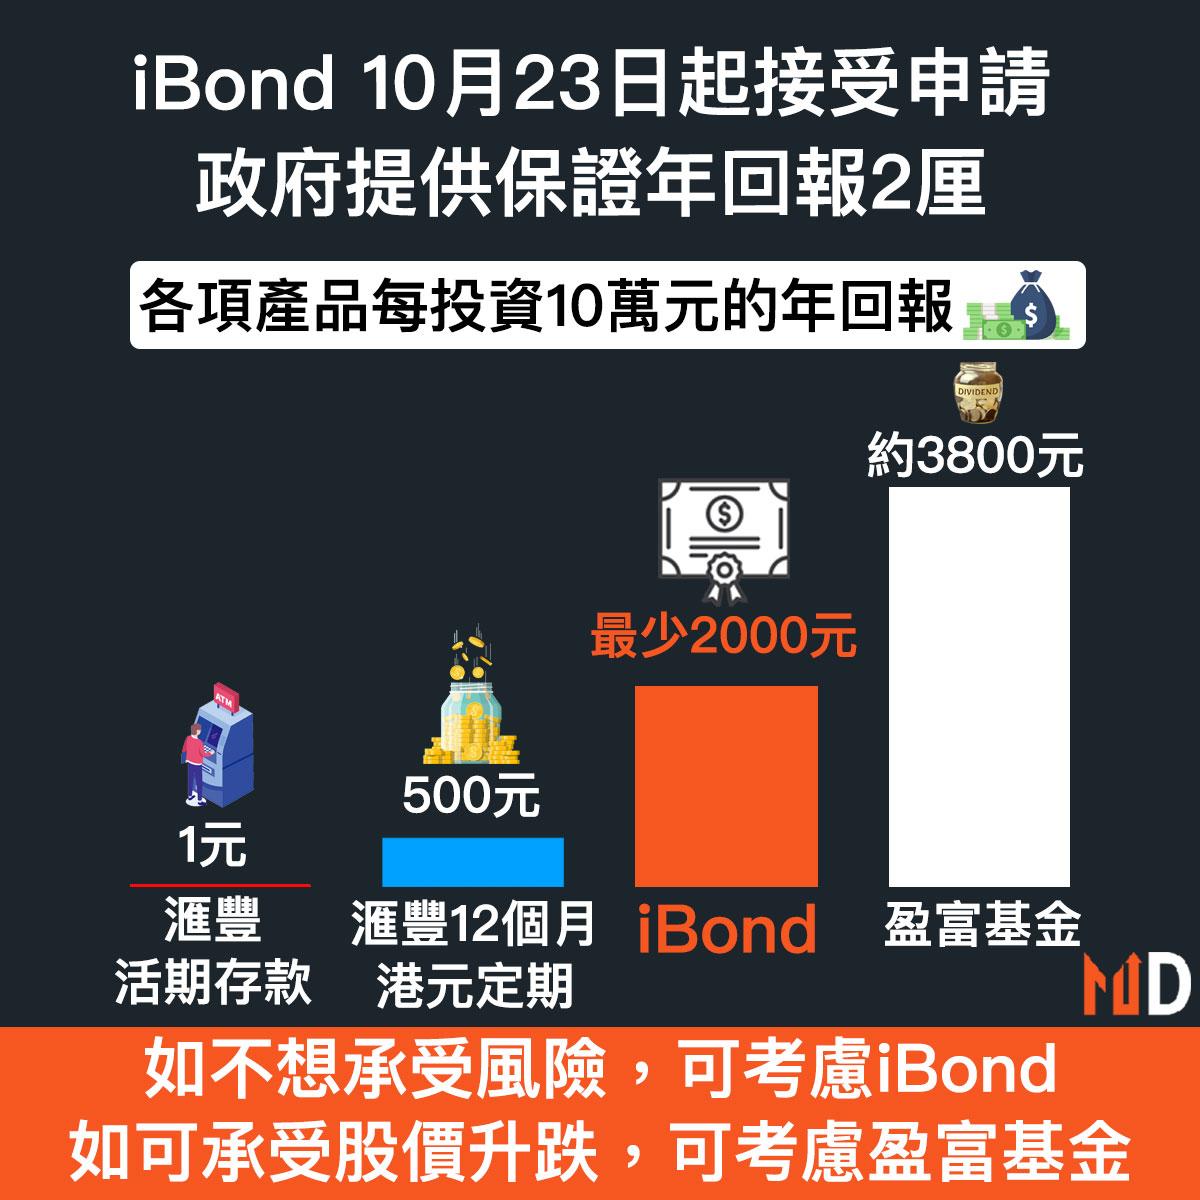 【iBond詳情】iBond 10月23日起接受申請,政府提供保證年回報2厘